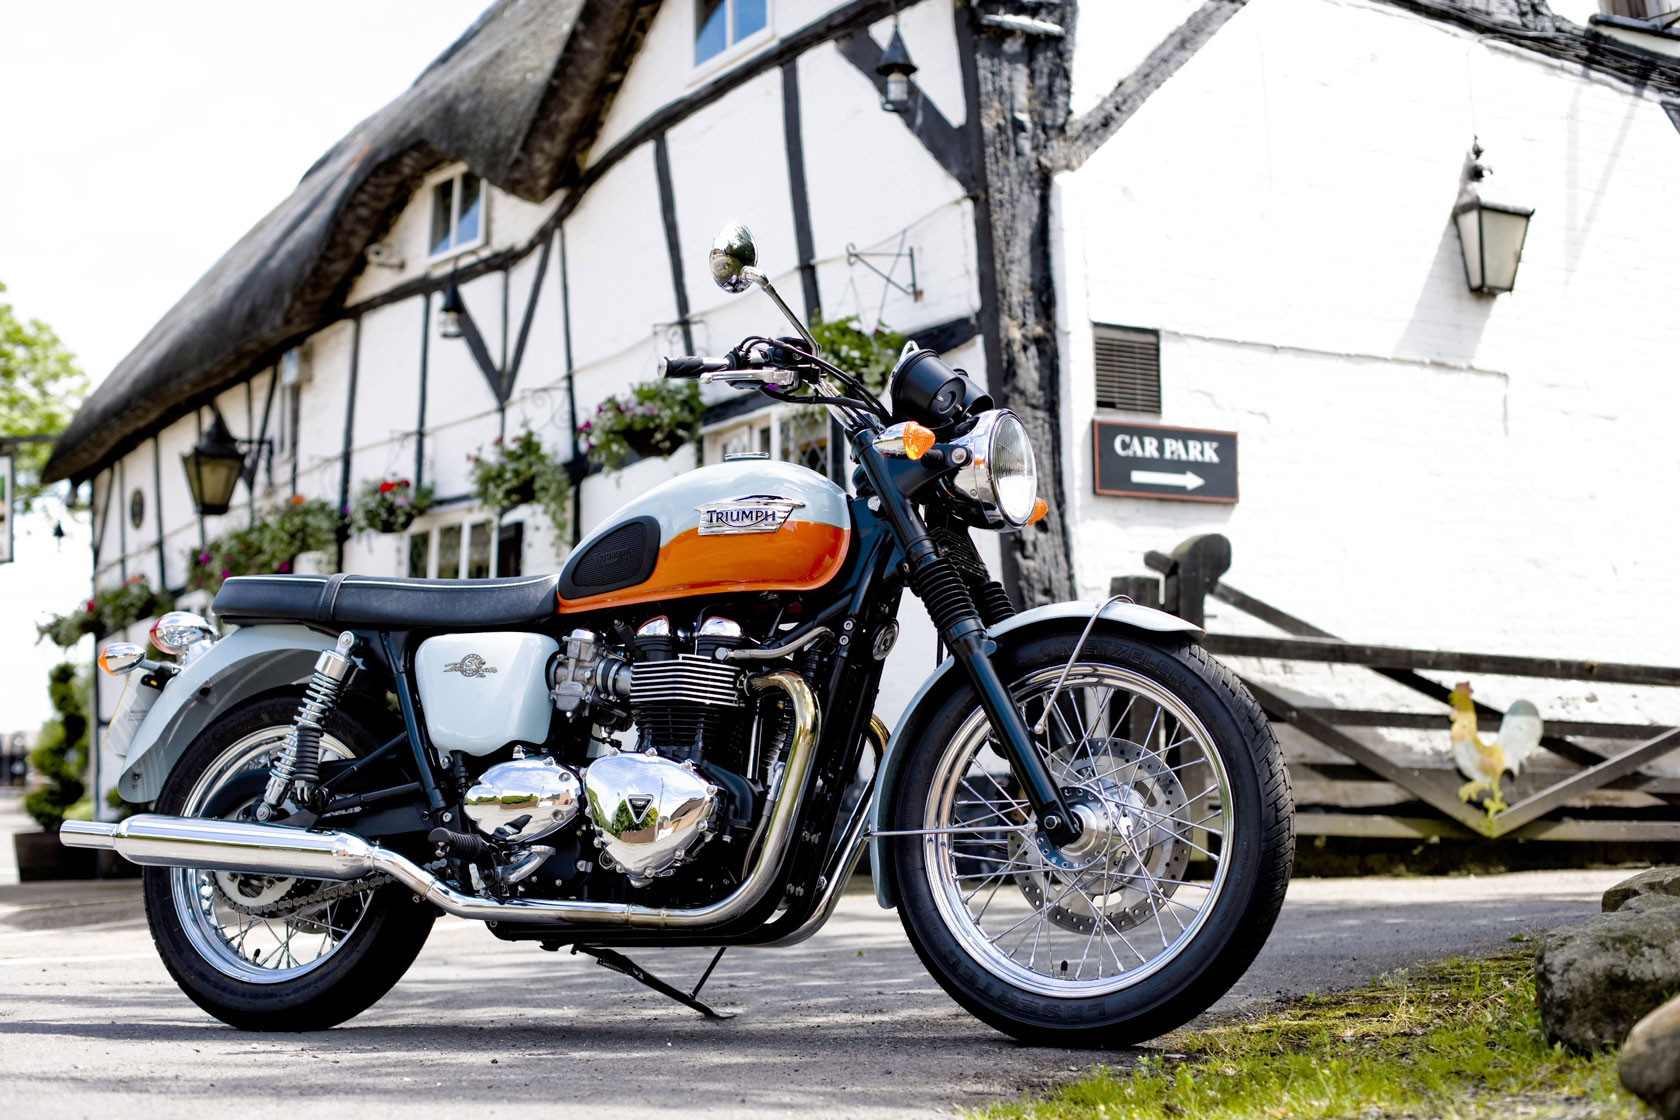 triumph bonneville t100 50th anniversary edition specs - 2008